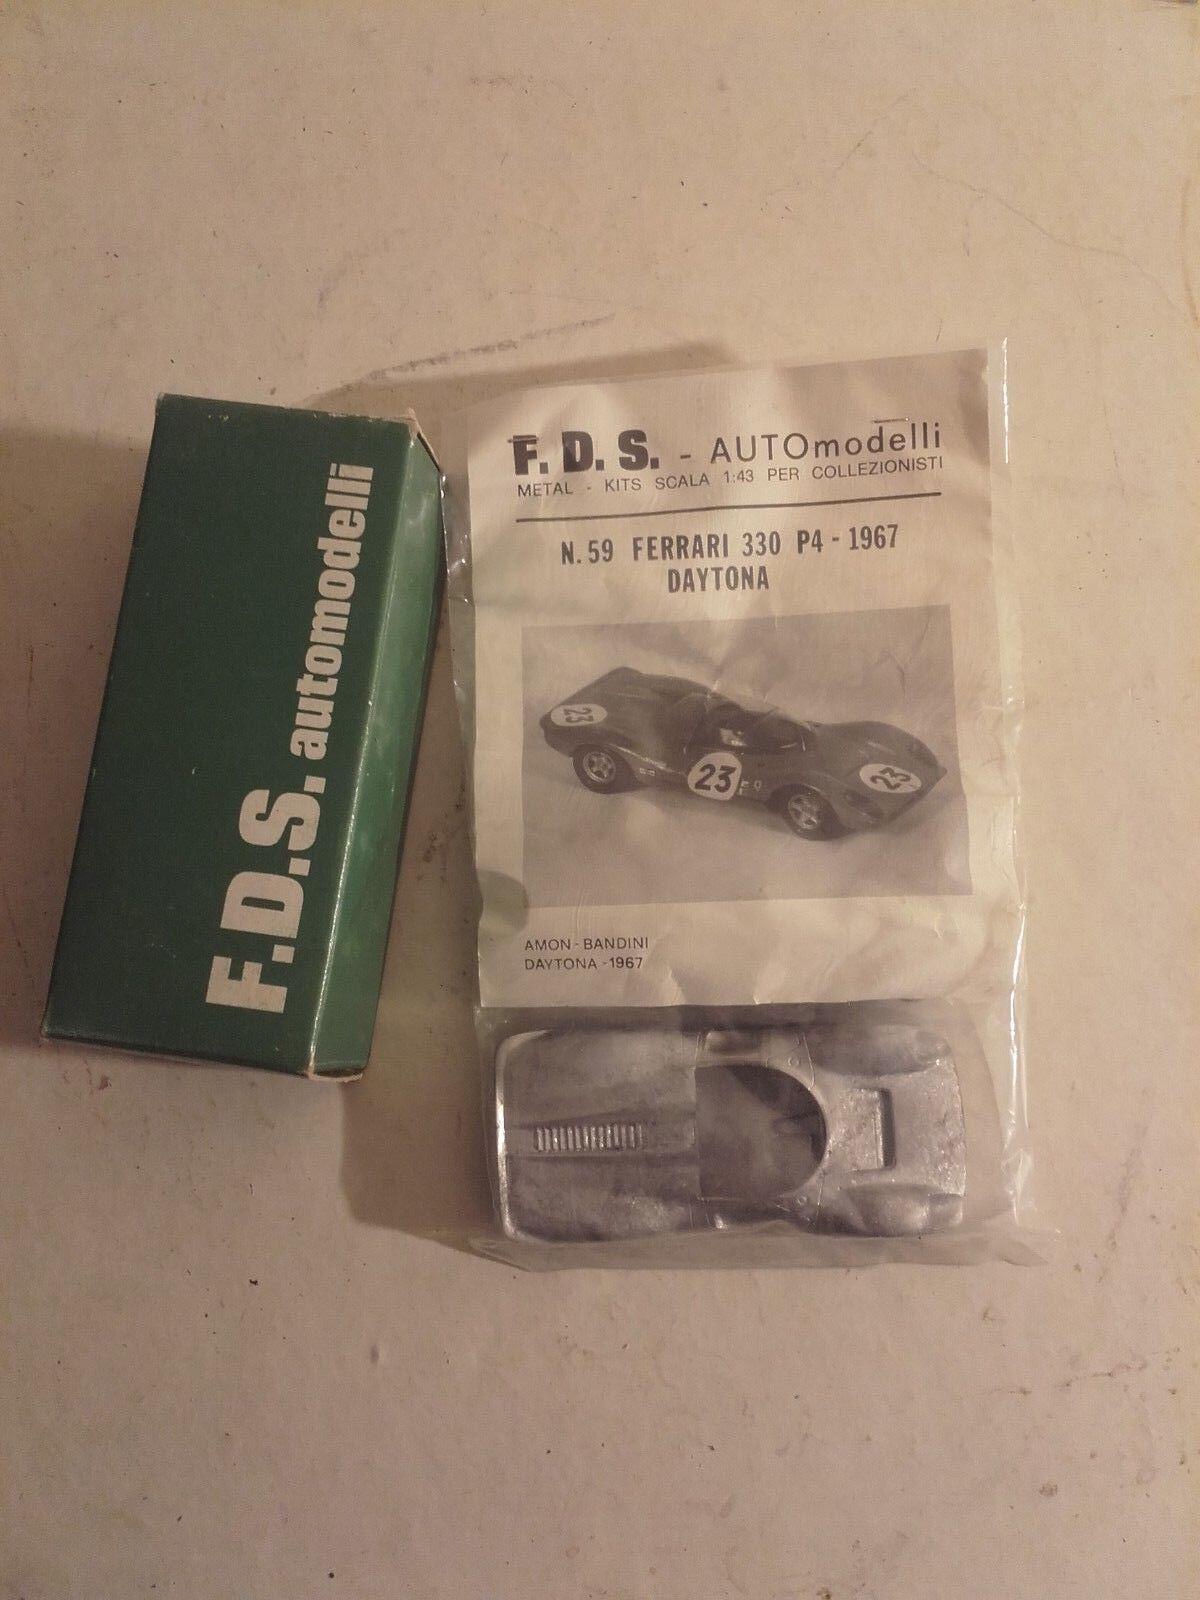 buena calidad Ferrari 330 p4  daytona mans 1967 1967 1967  kit fds neuf jamais ouverde  en venta en línea